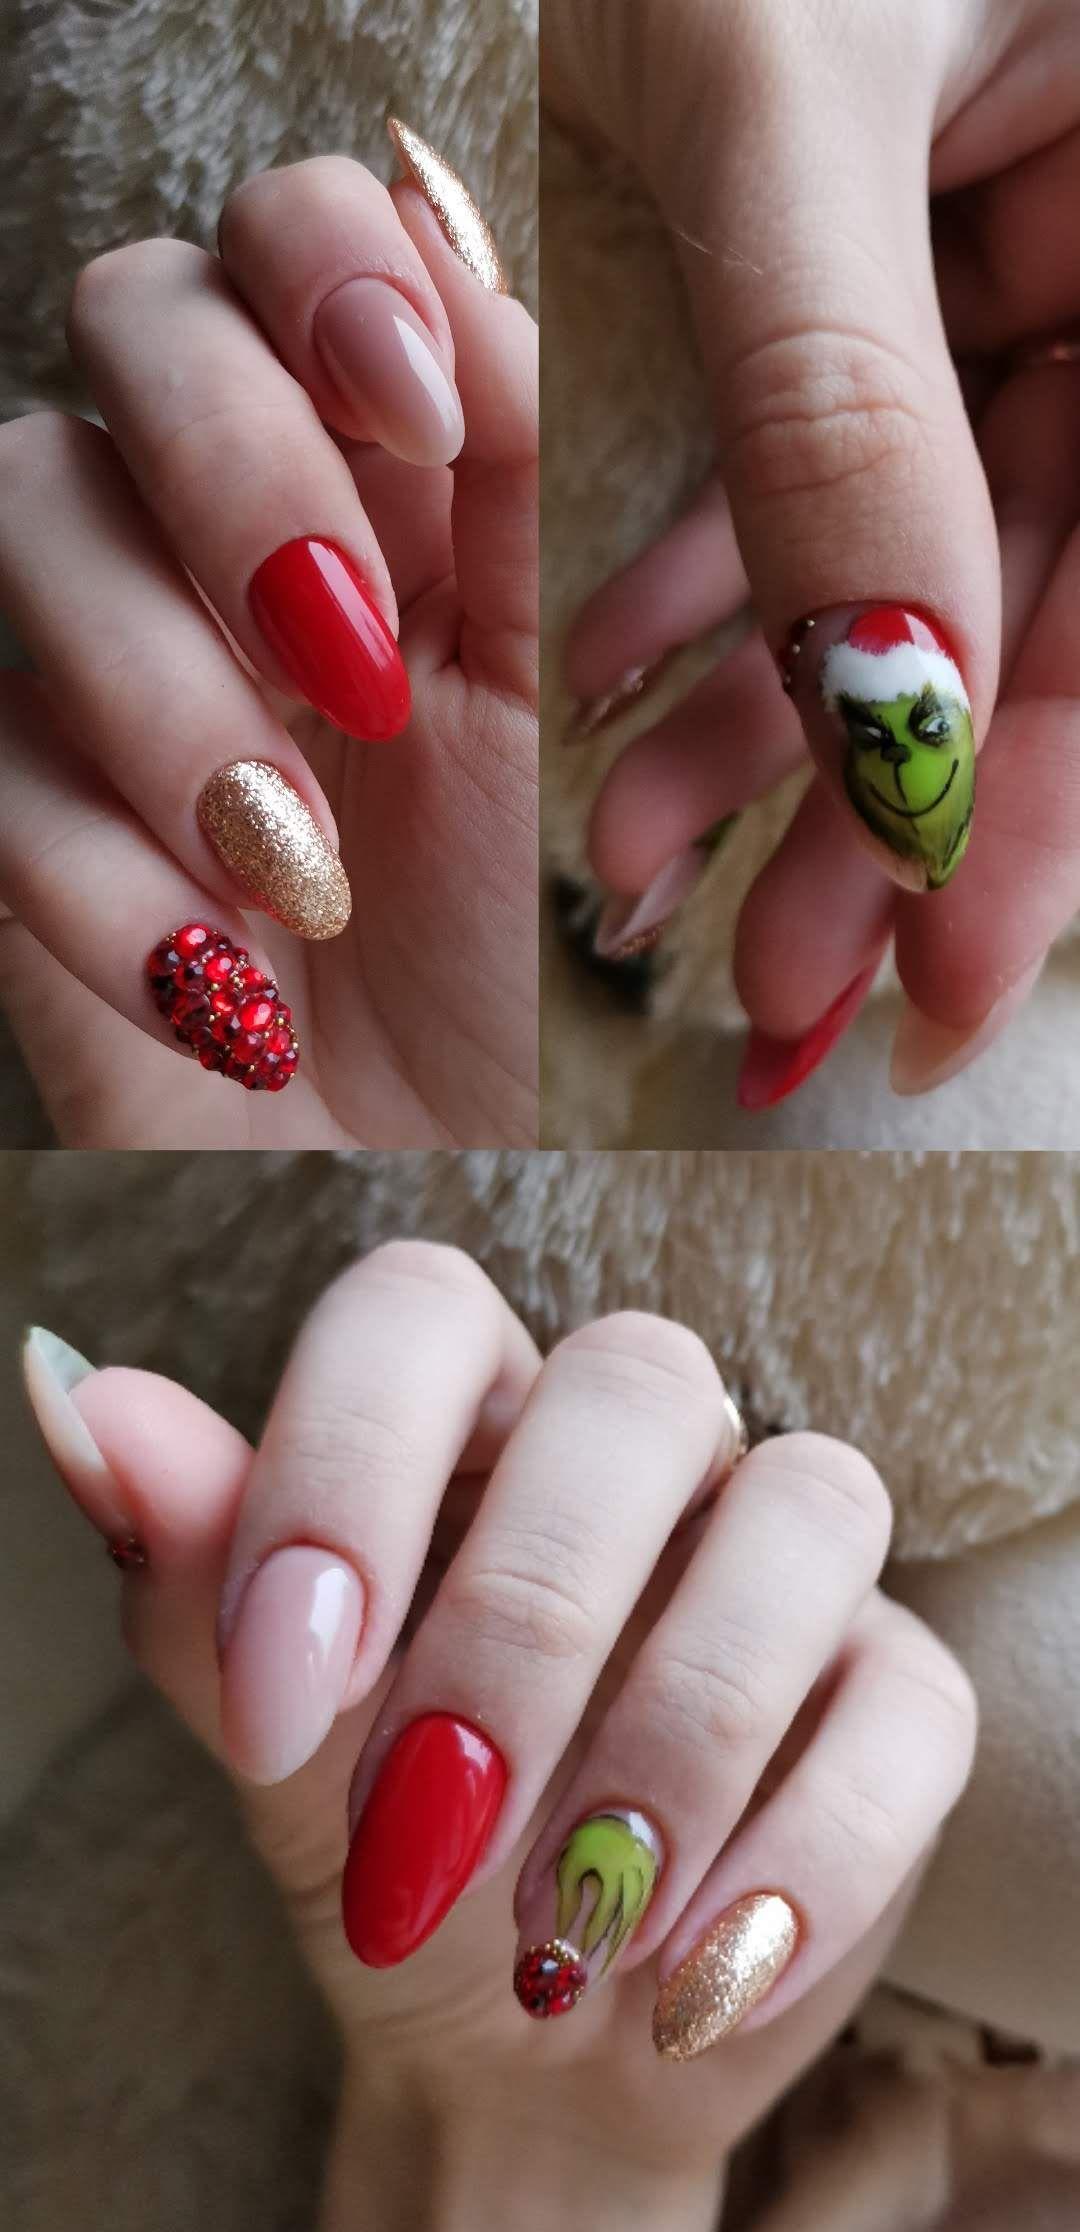 Nails Manicure Grinch Новогодний маникюр Гринч